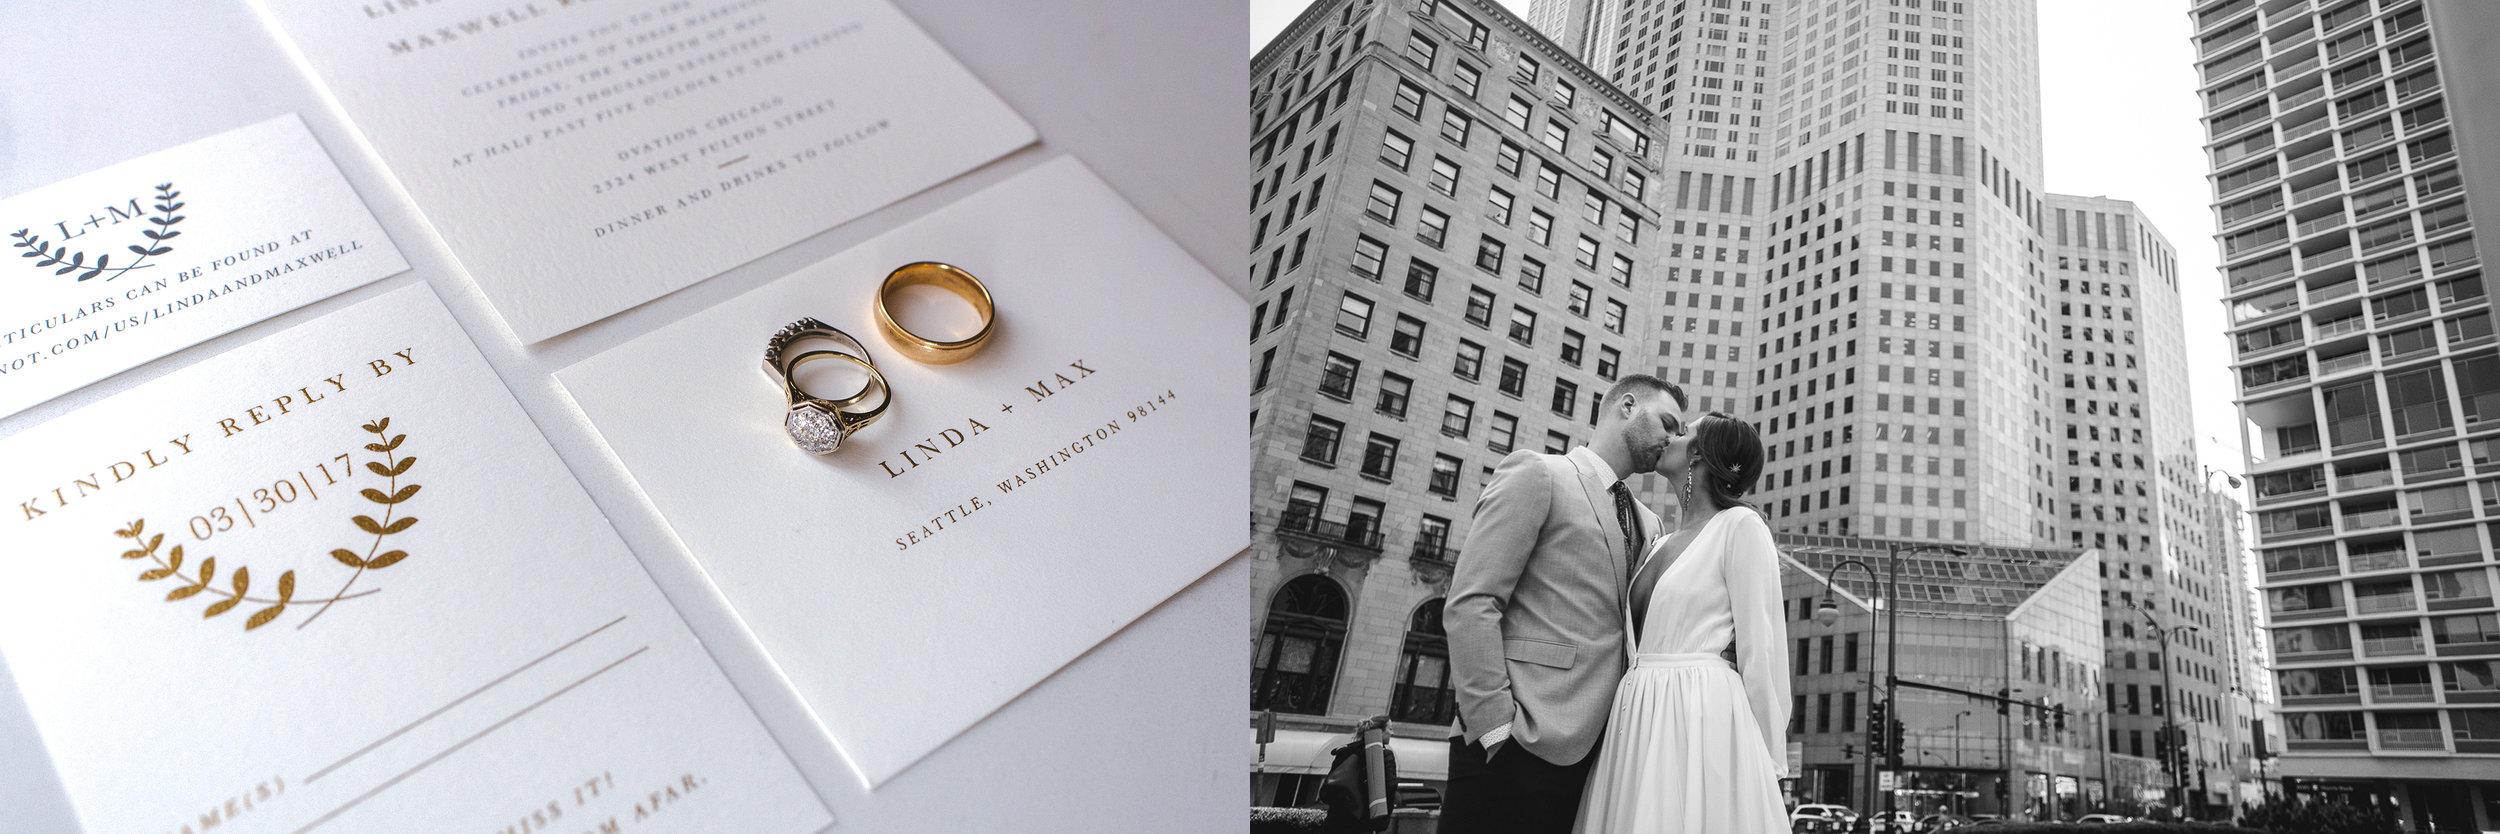 chicago_wedding_photography_zoe_rain_01.jpg